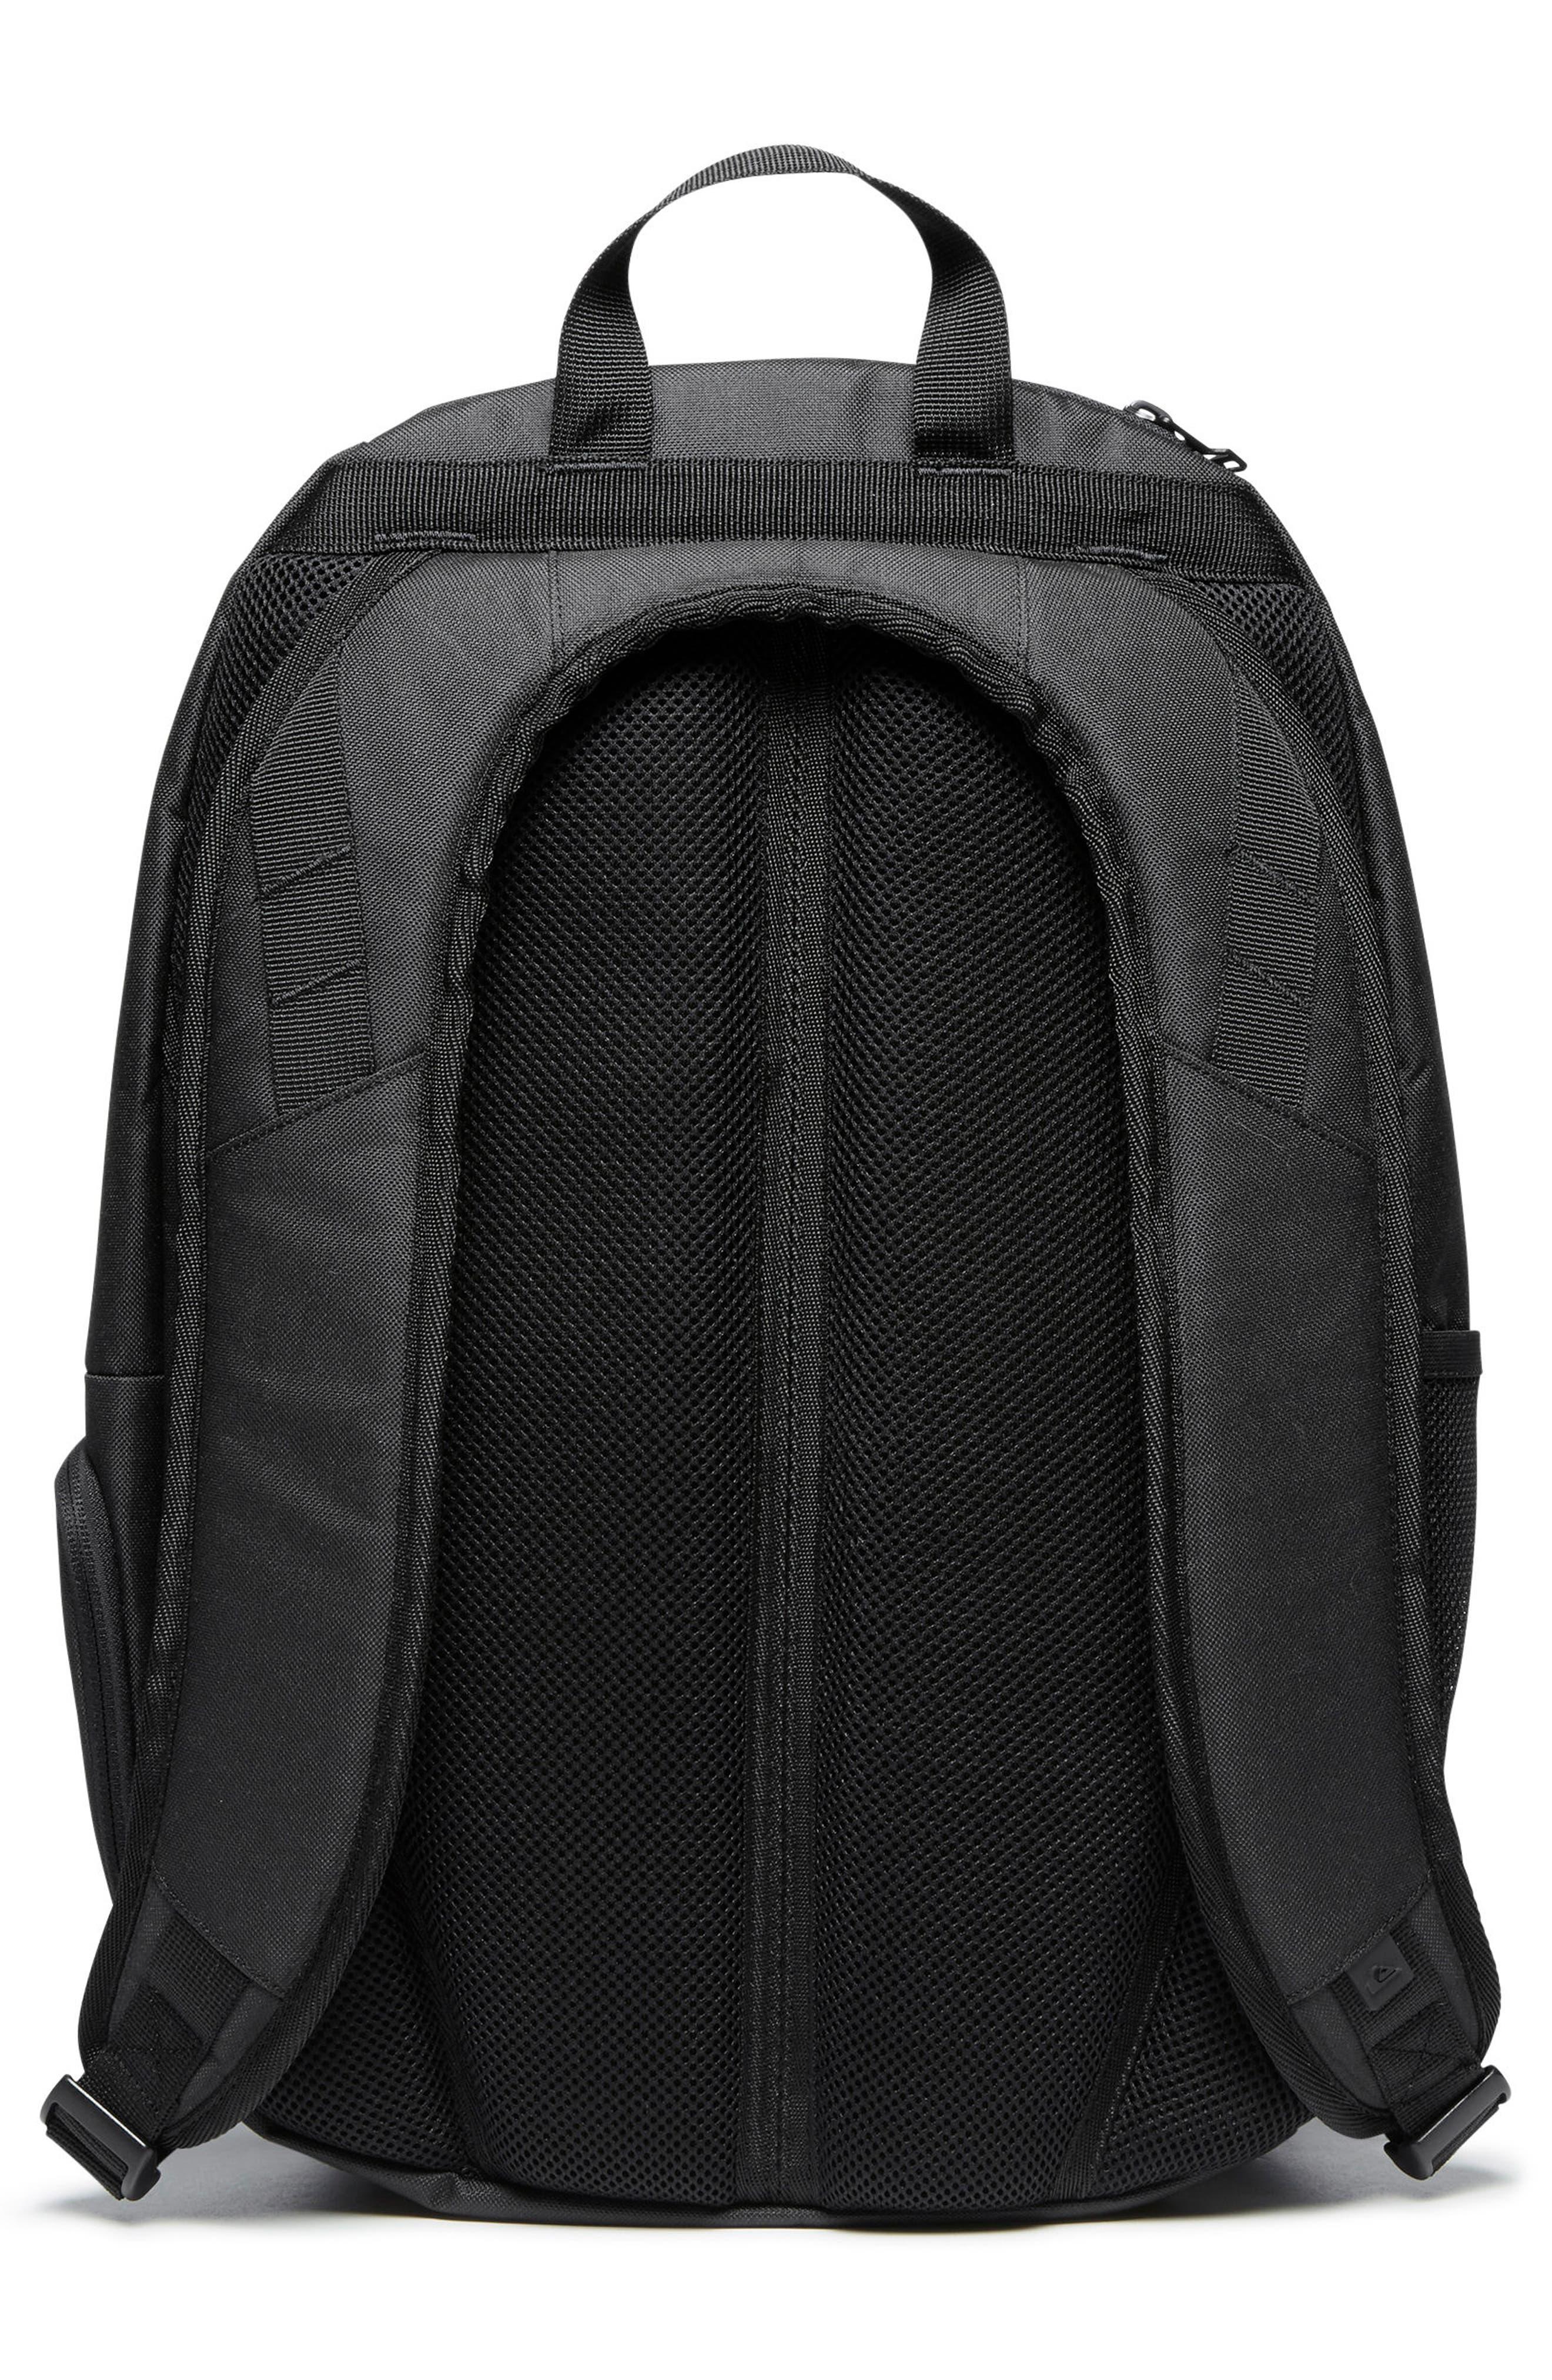 QUIKSILVER, Diaper Backpack, Alternate thumbnail 3, color, BLACK